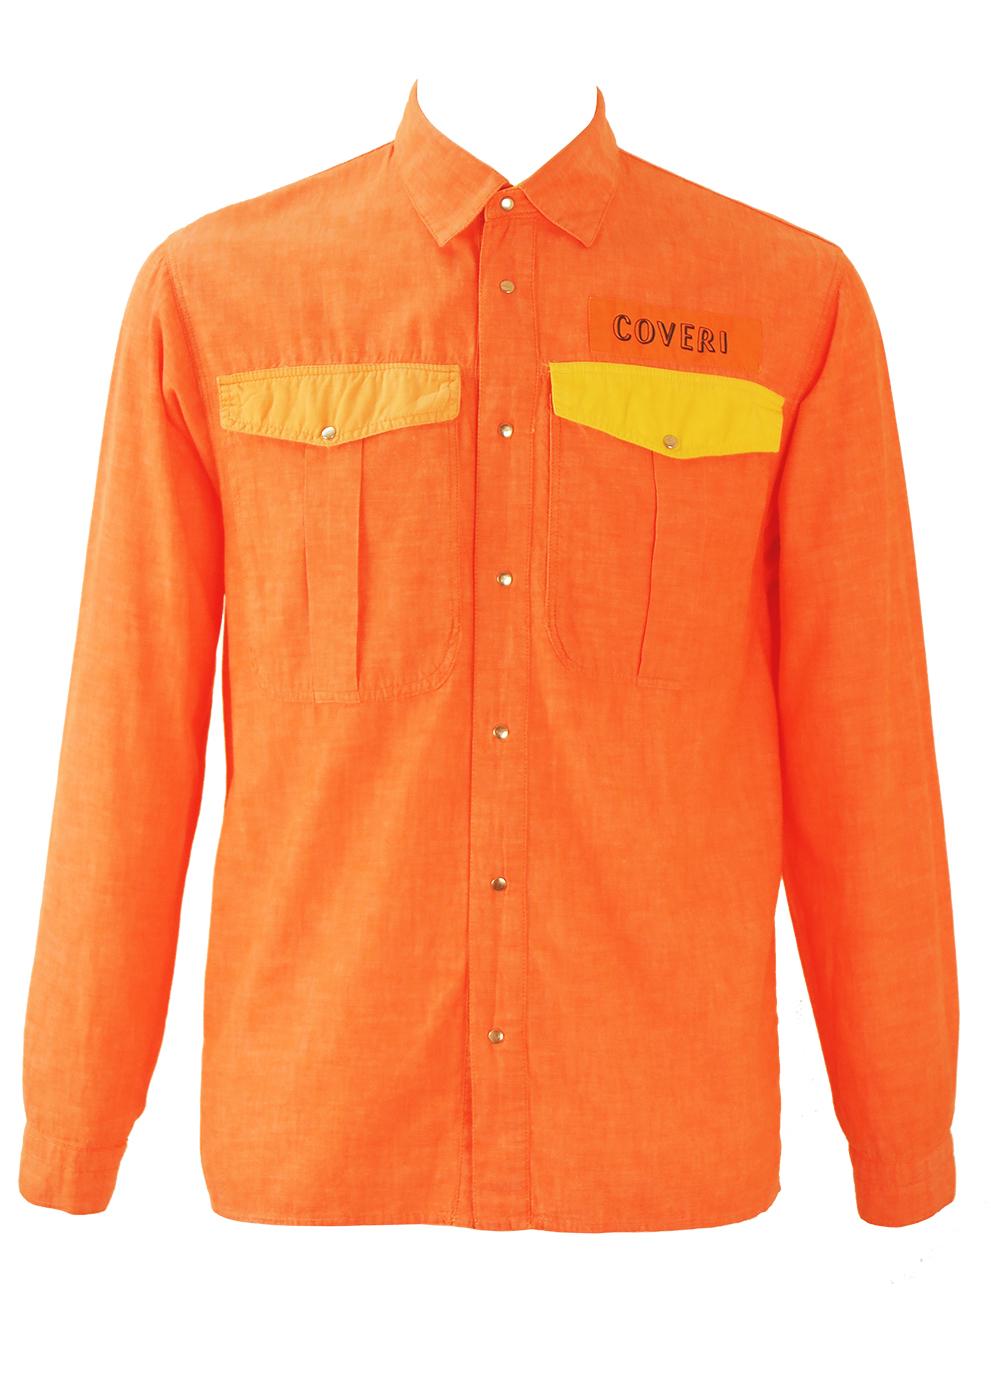 Enrico Coveri Orange Shirt with Neon Yellow & Peach Pocket ...